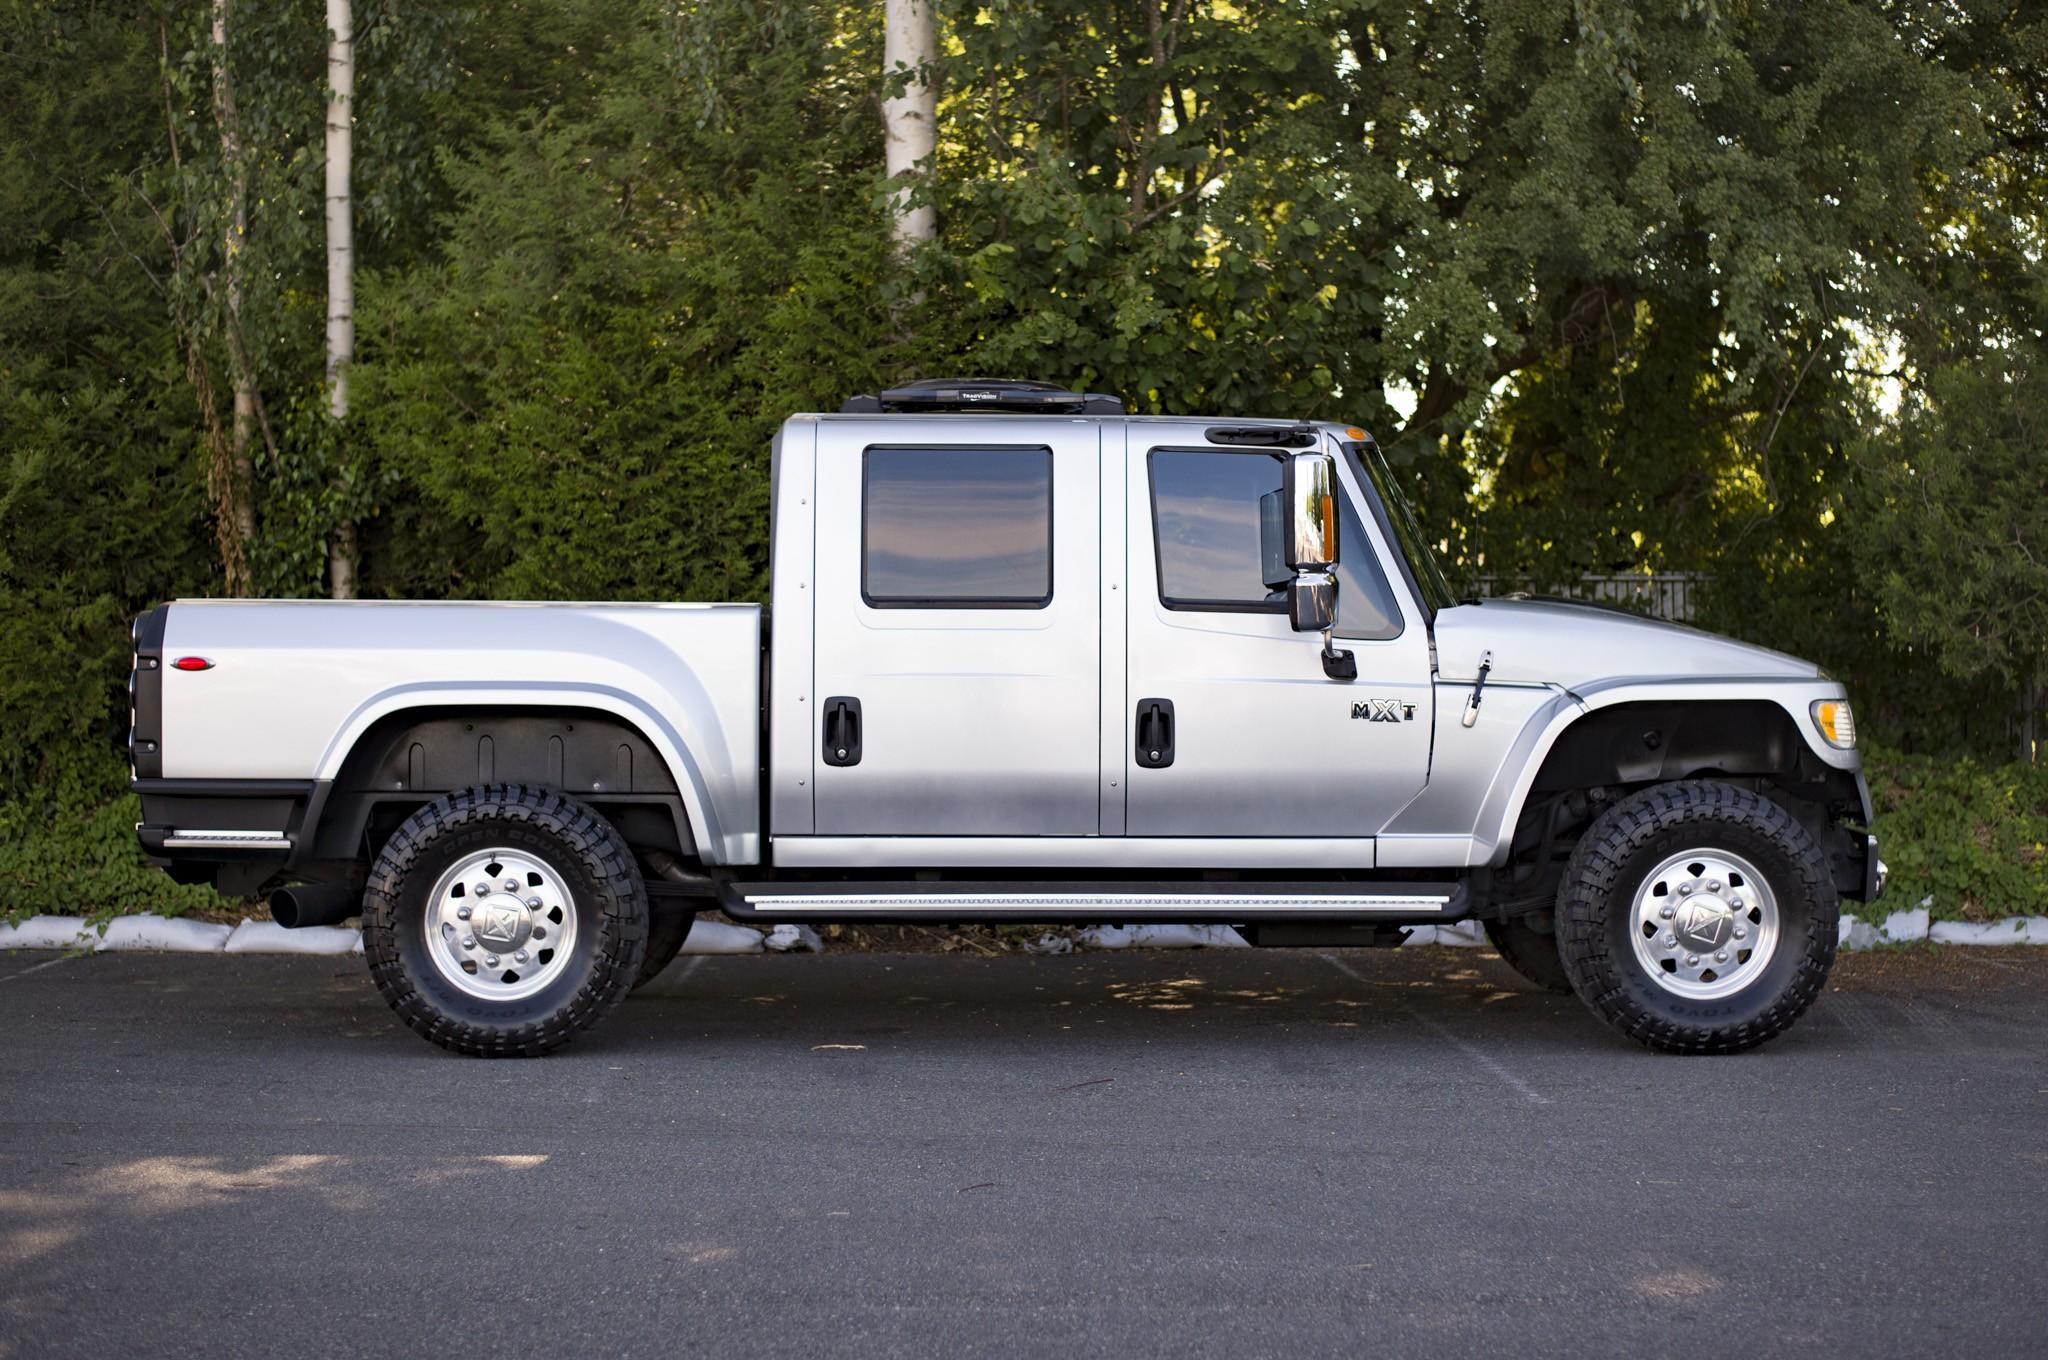 International Cxt Truck For Sale Deliciouscrepesbistro Com